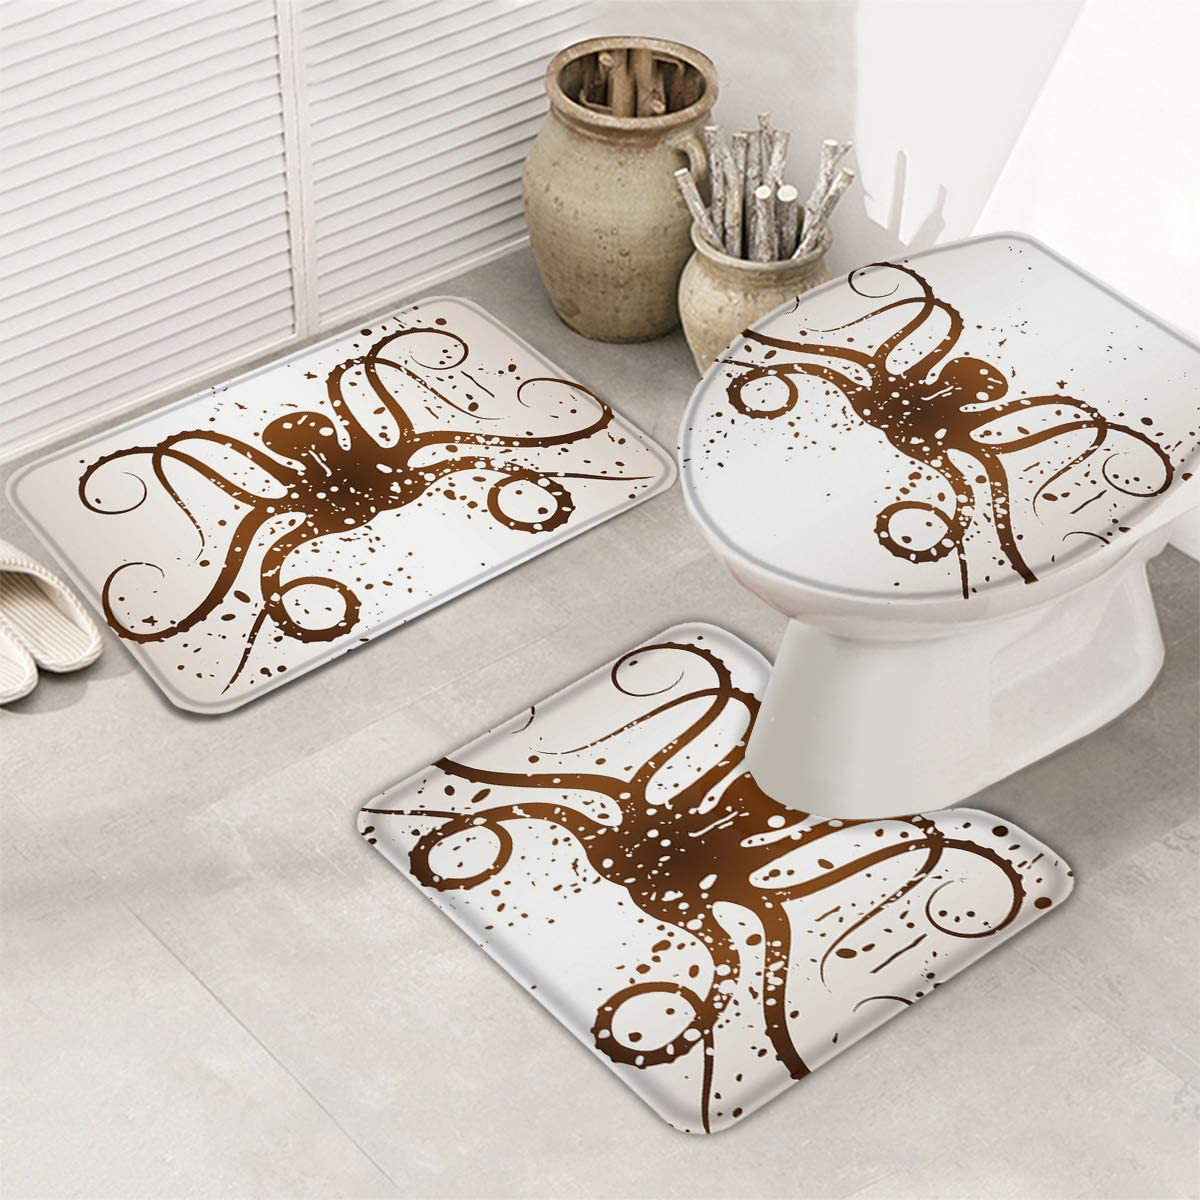 IDOWMAT Spasm price 3 Piece Bath Rug Abstract Ma Octopus Bathroom Ink Splash Popular standard